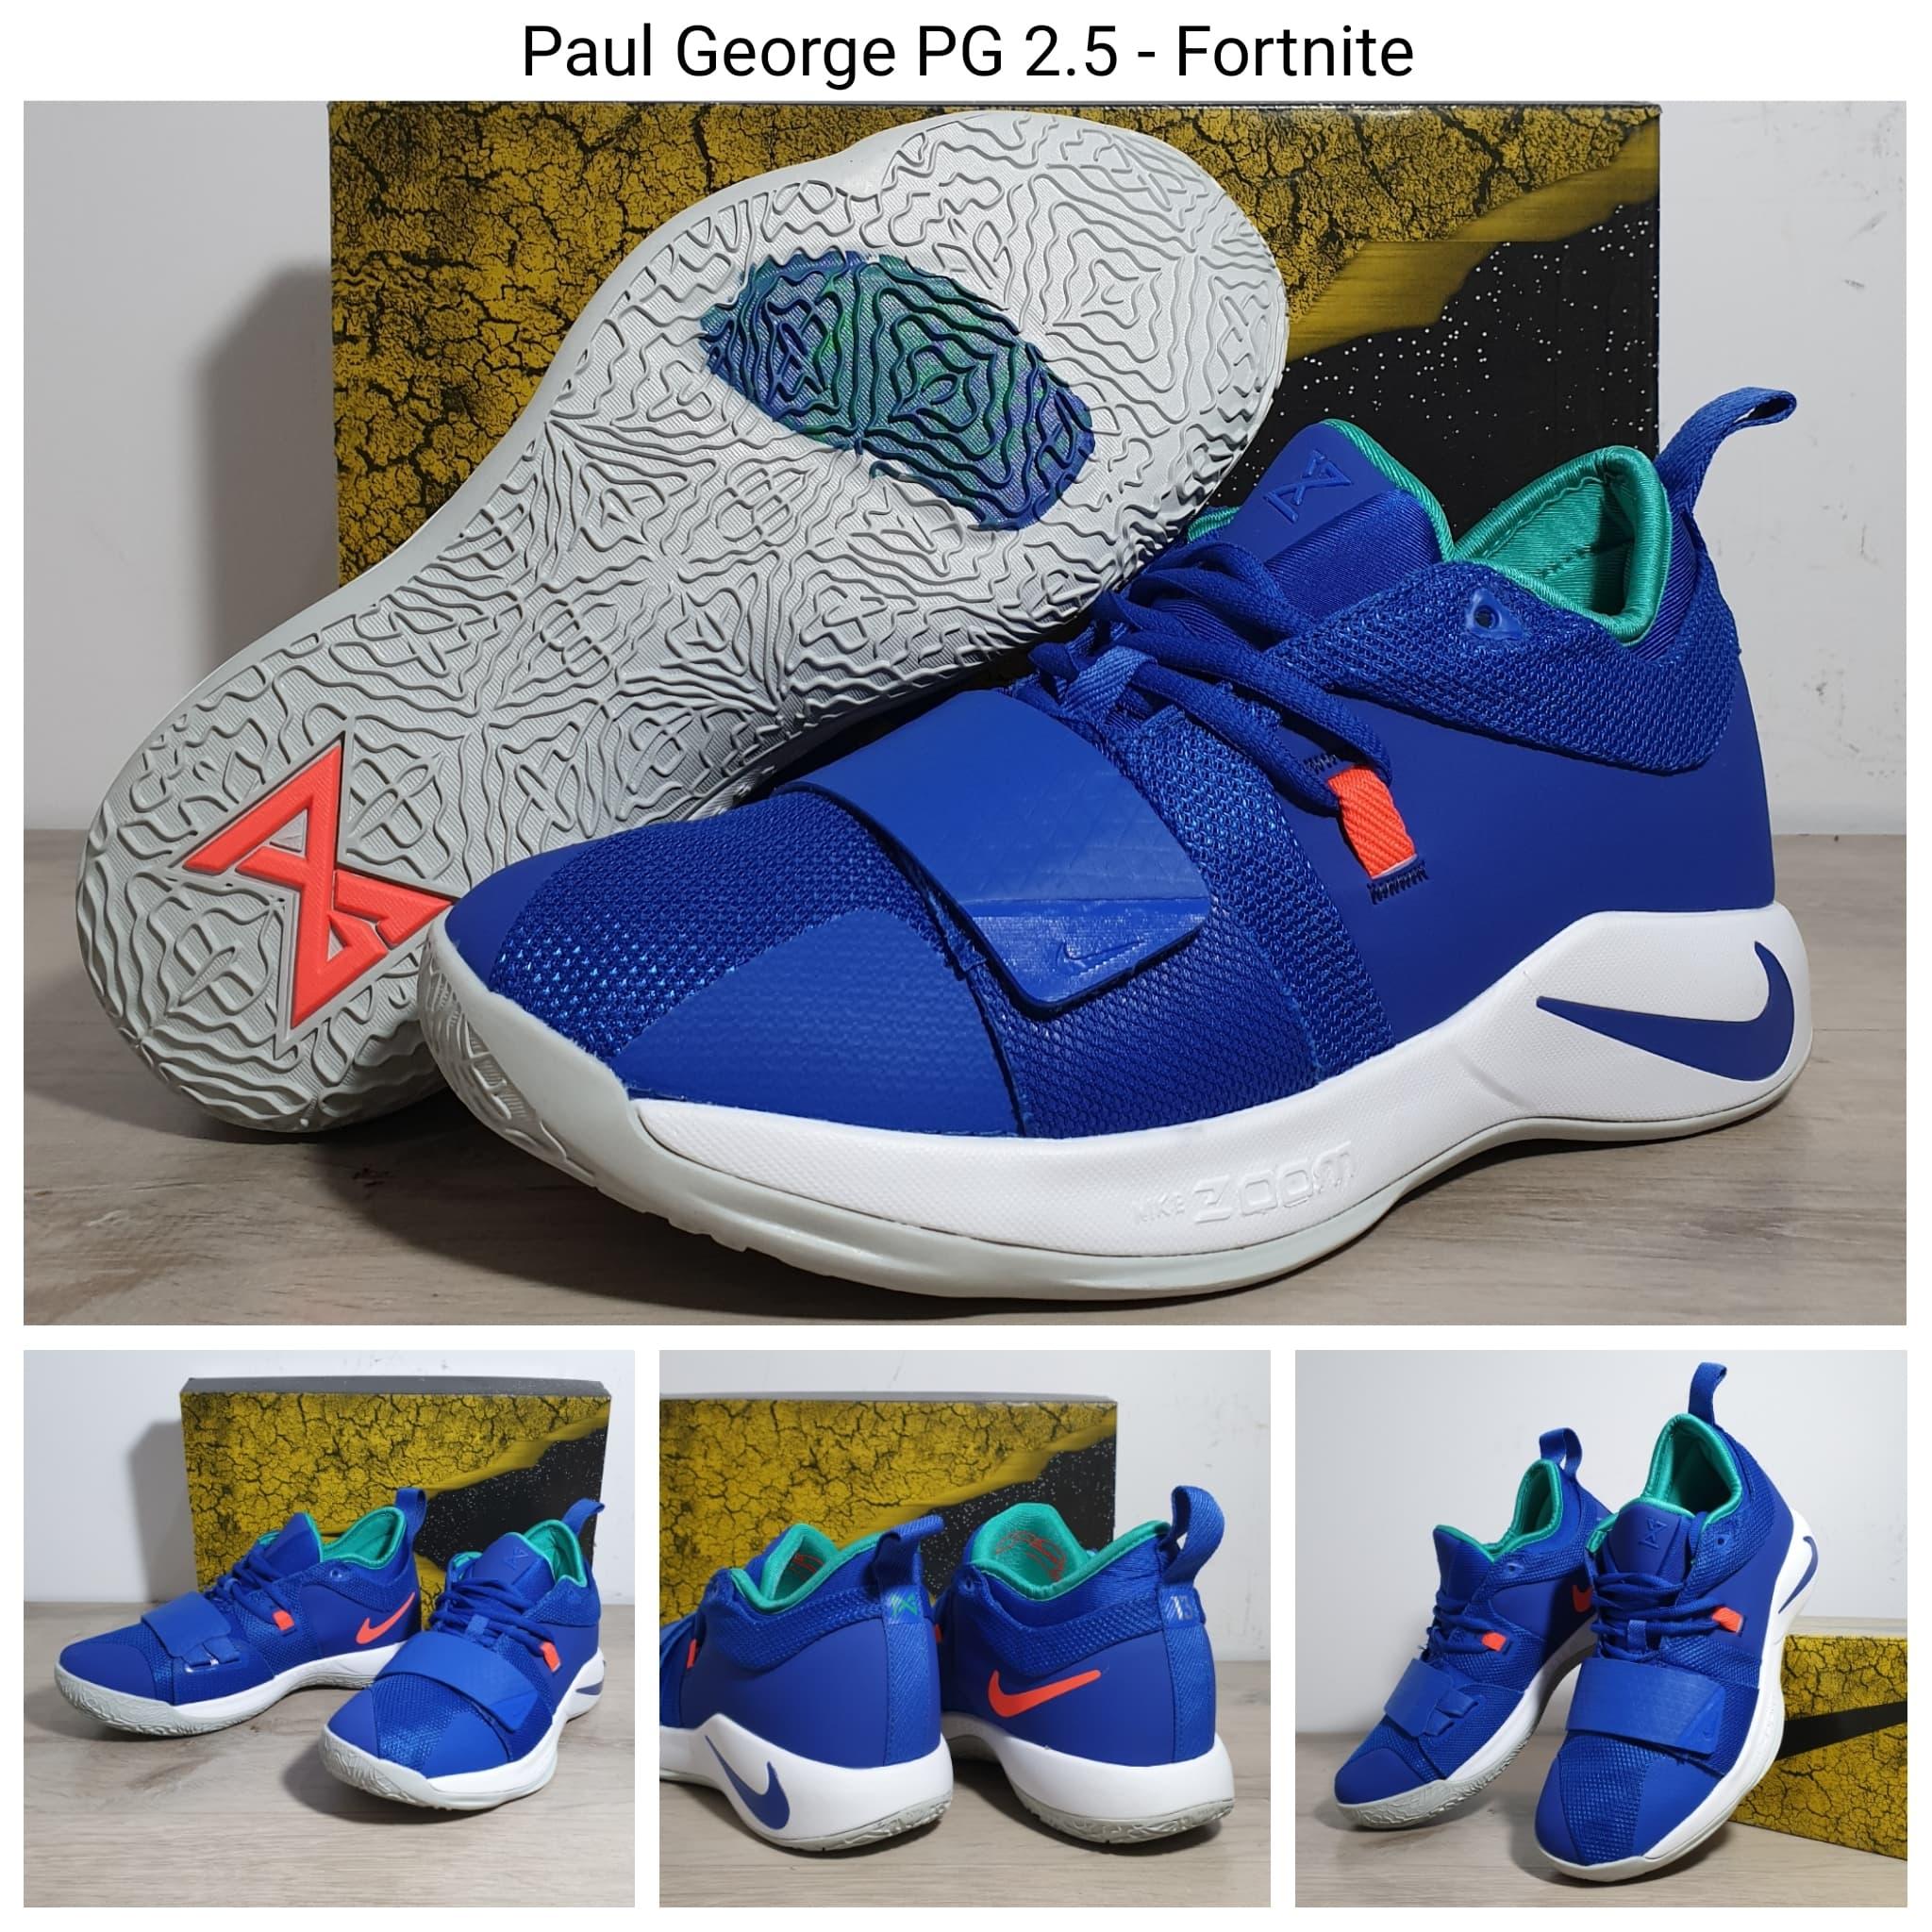 huge discount 08a32 228a2 Jual Sepatu Basket Nike Paul George 2.5 Fortnite (PG 2.5 ...